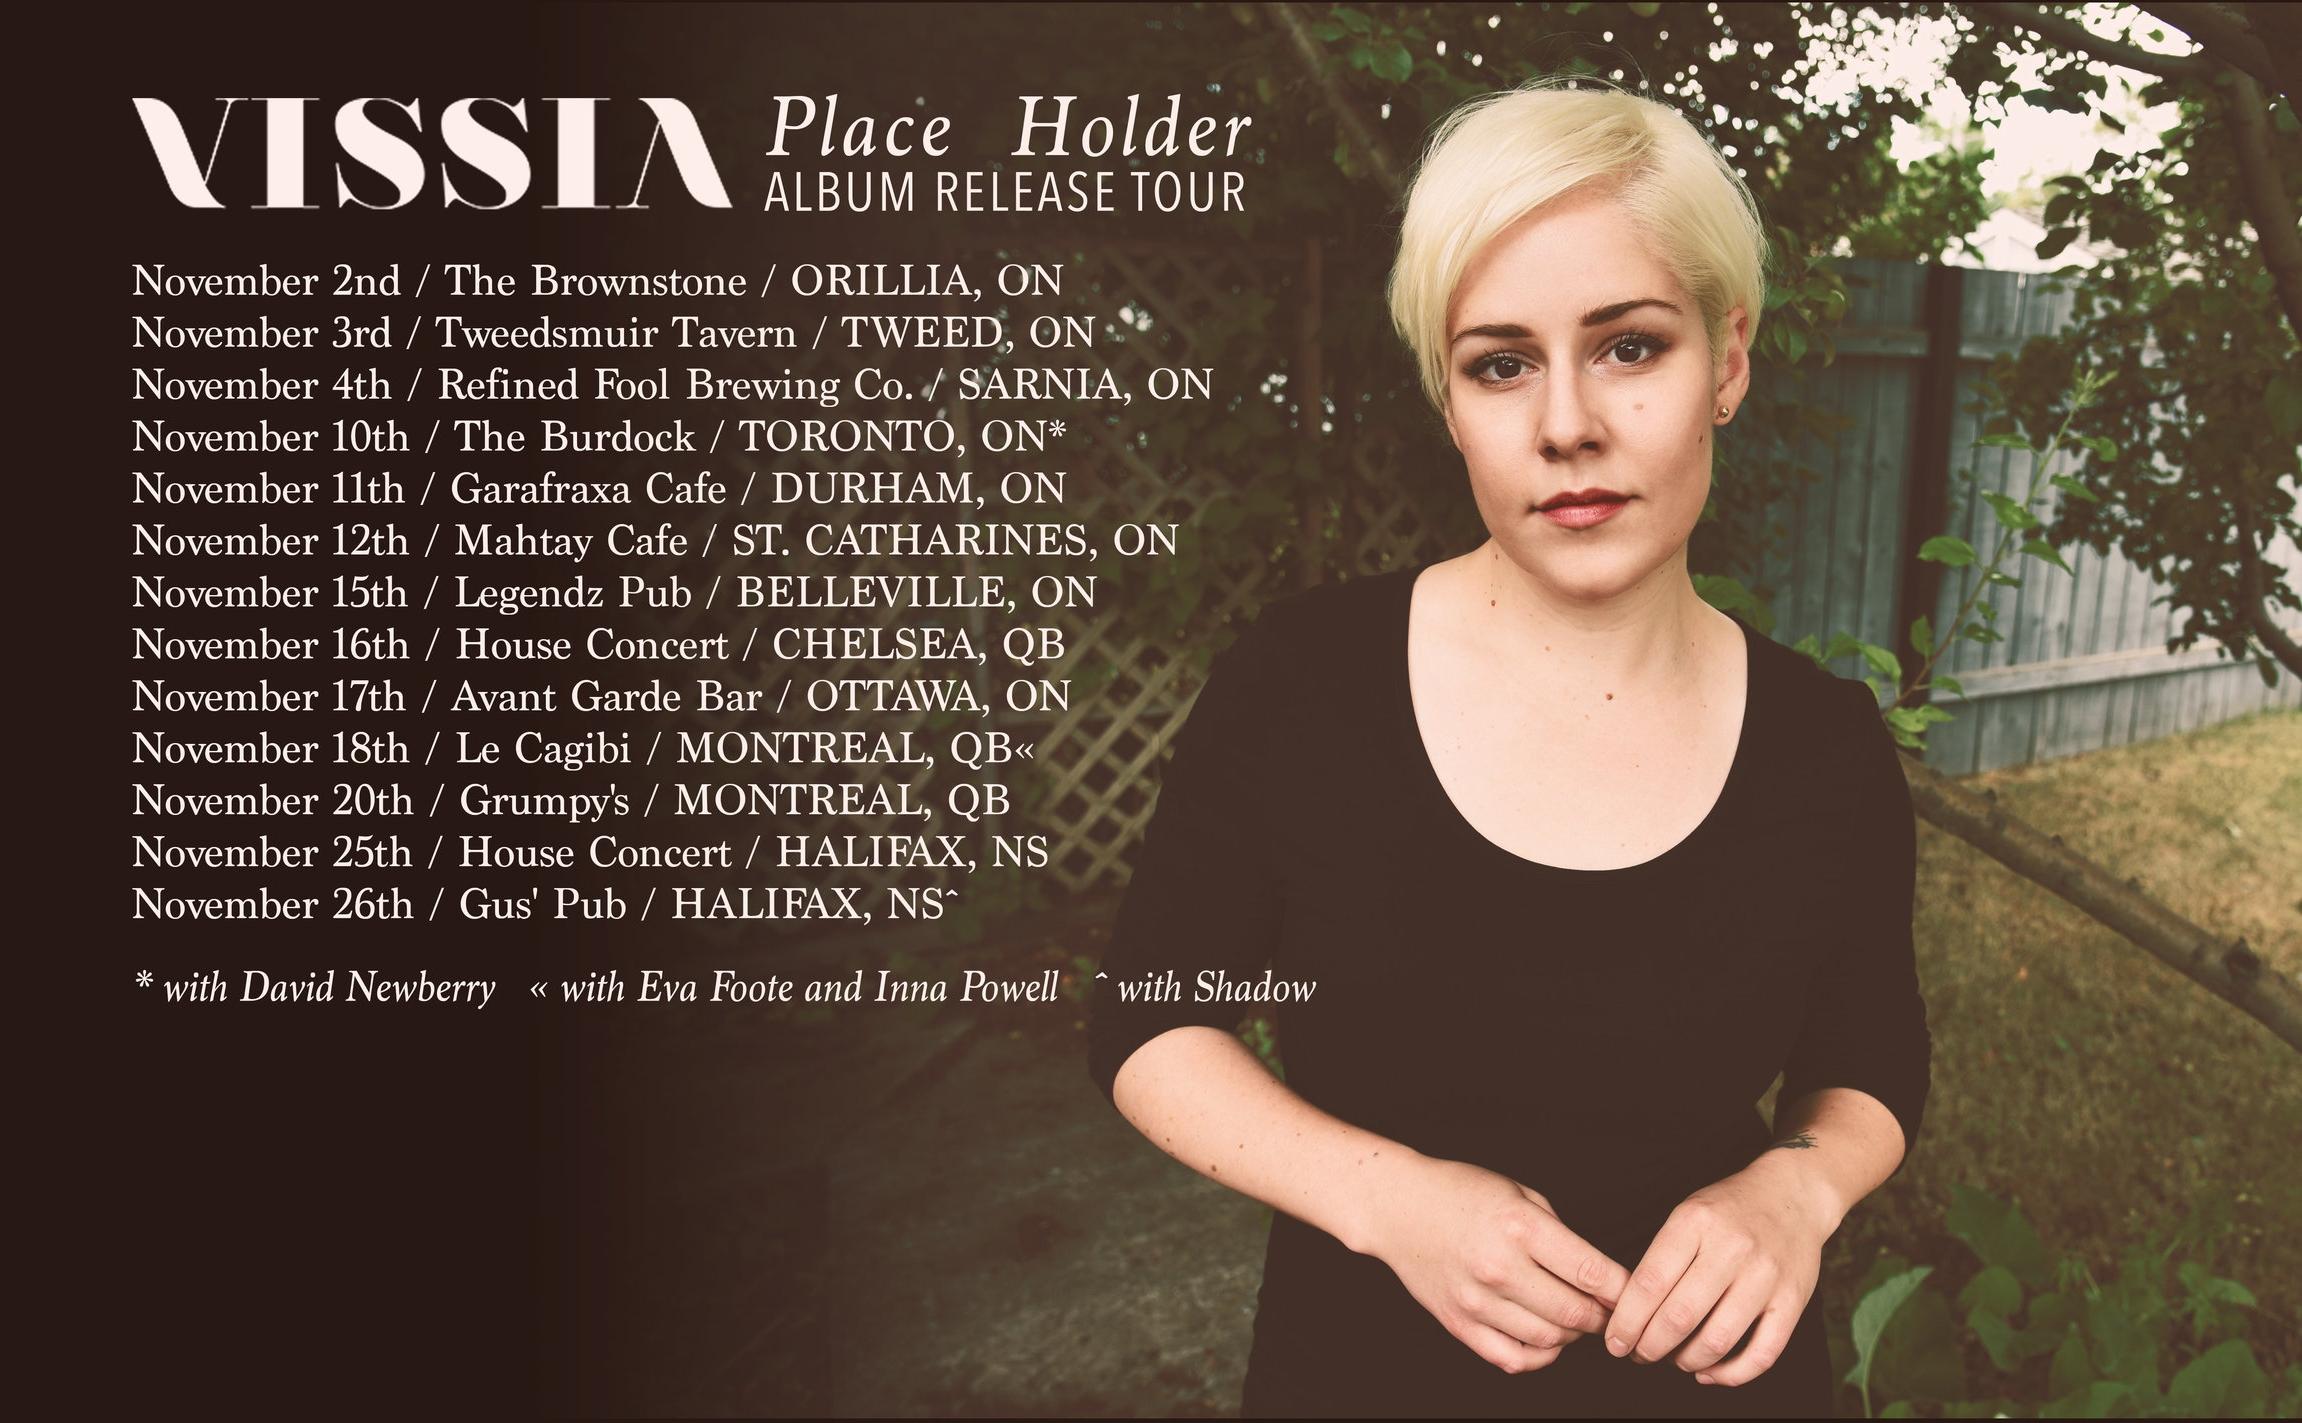 VISSIA Canadian tour